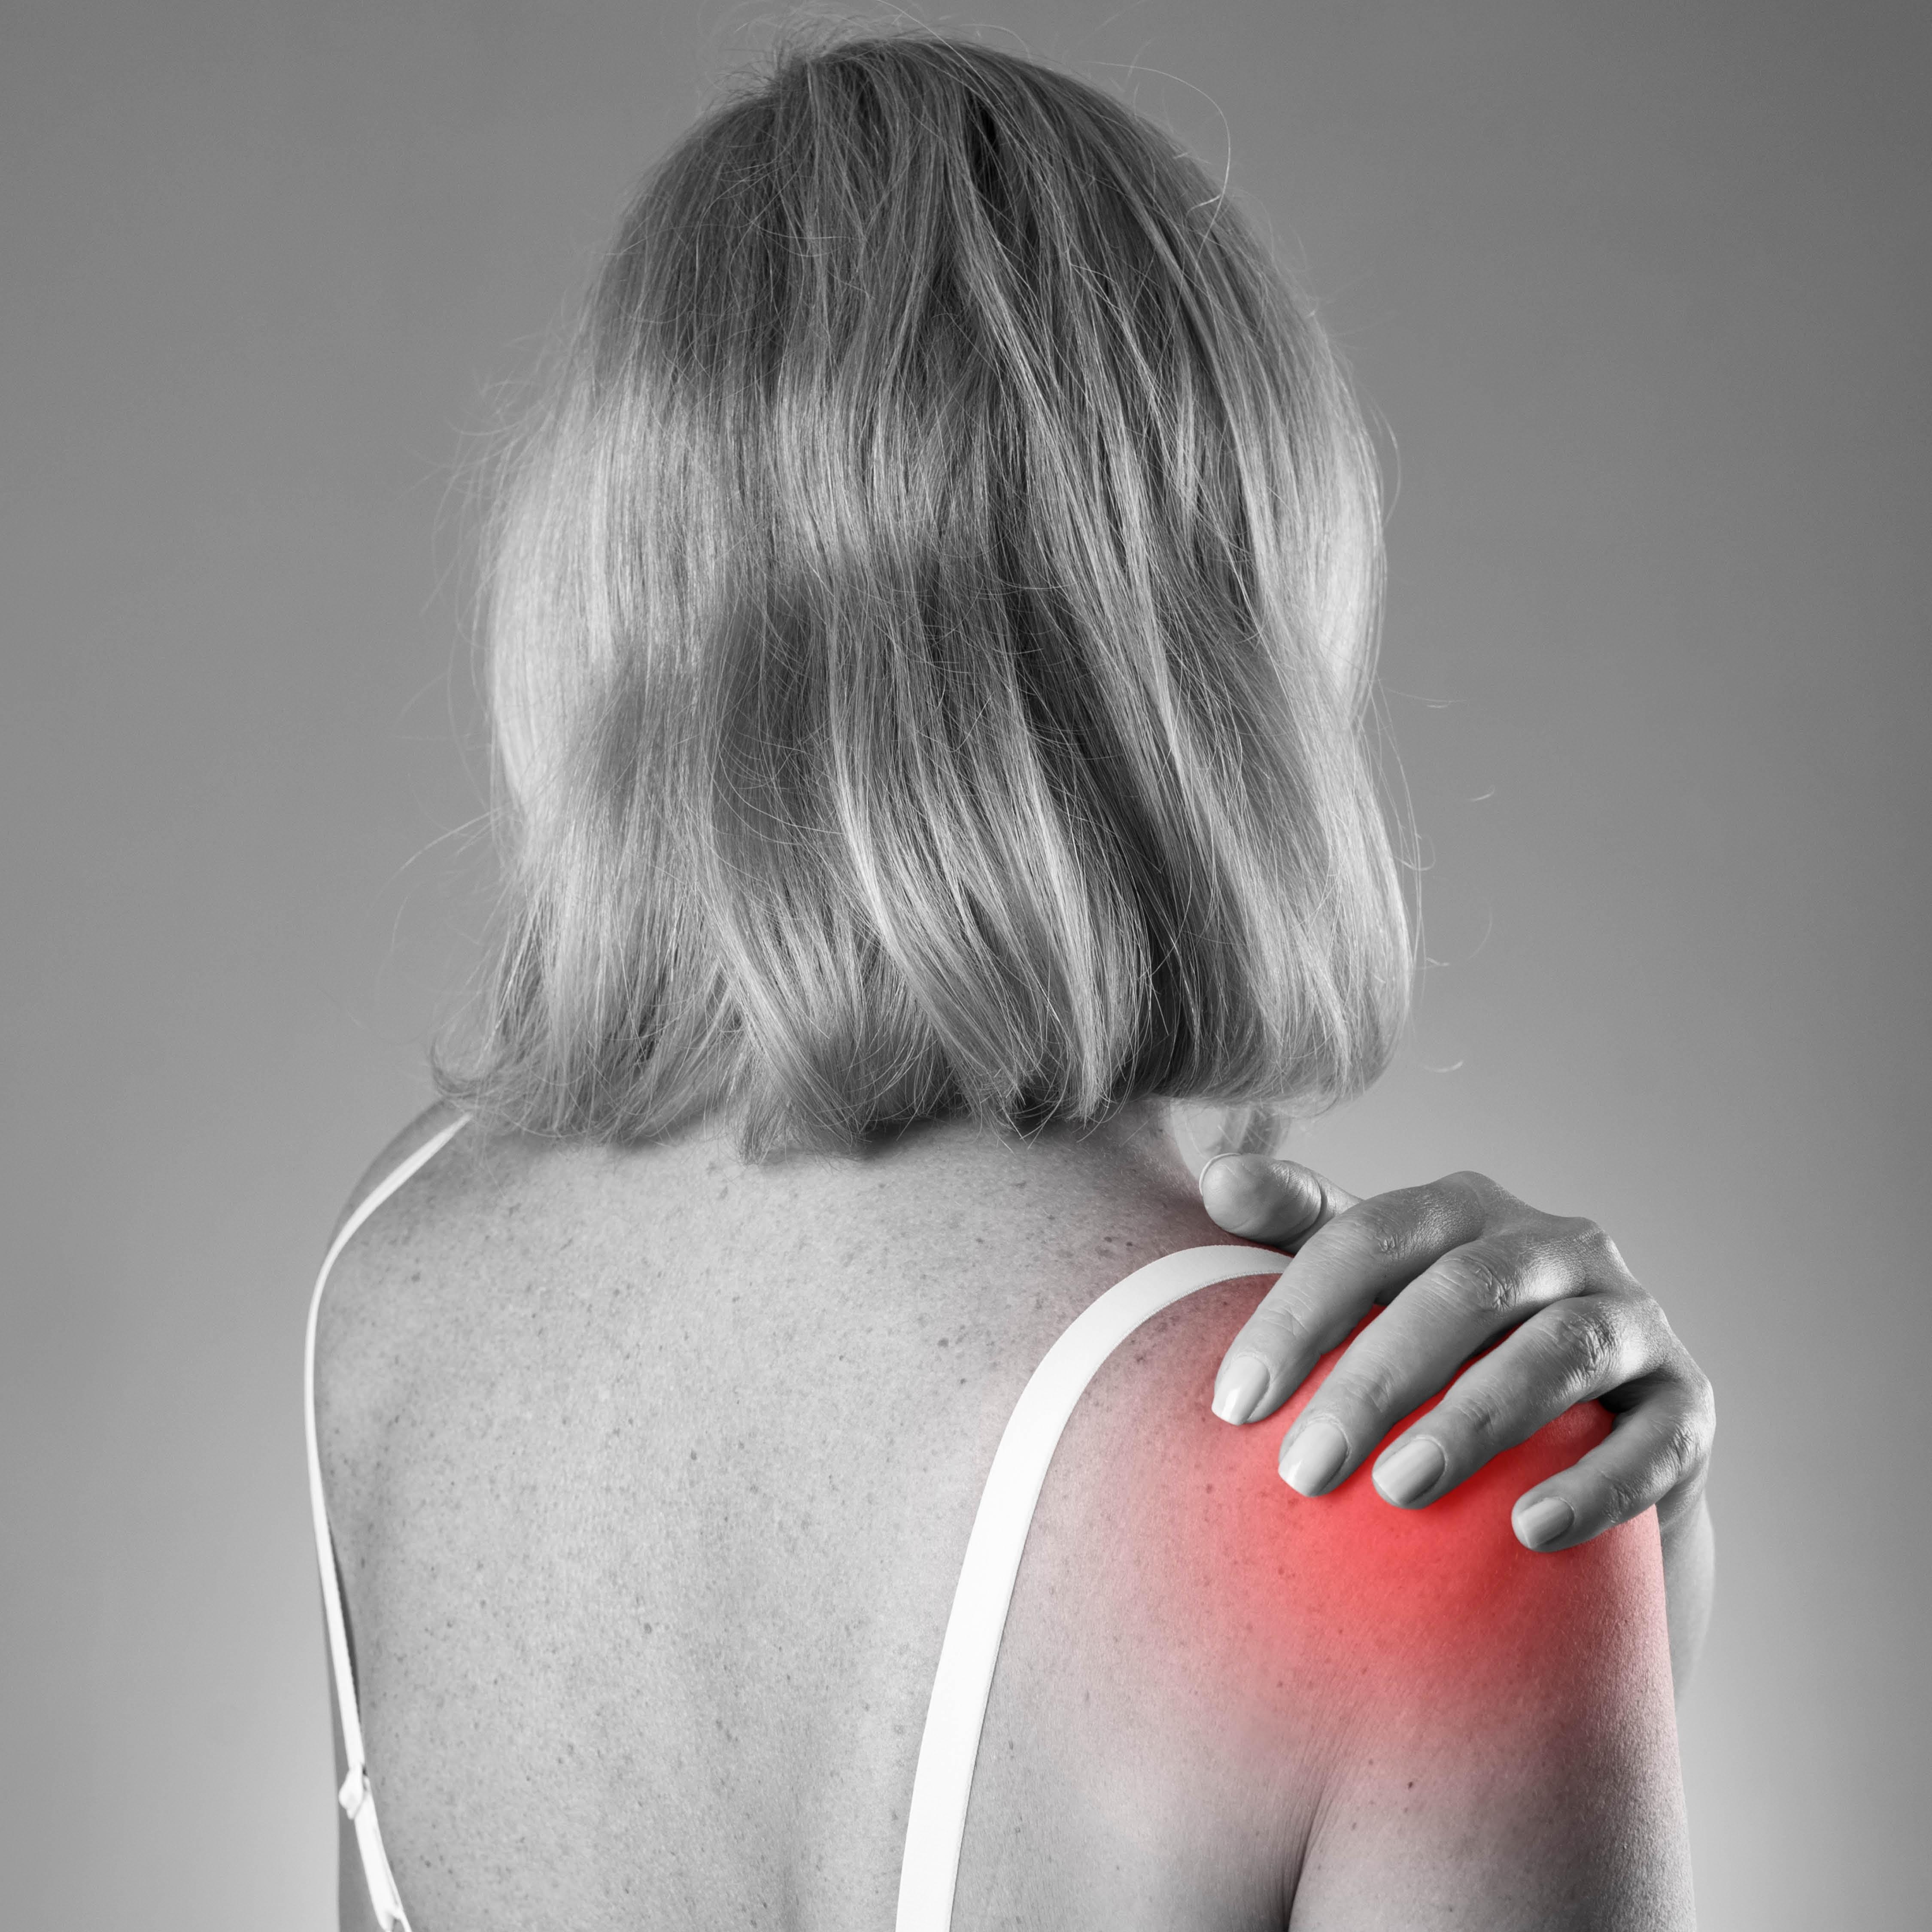 Woman experiencing shoulder pain